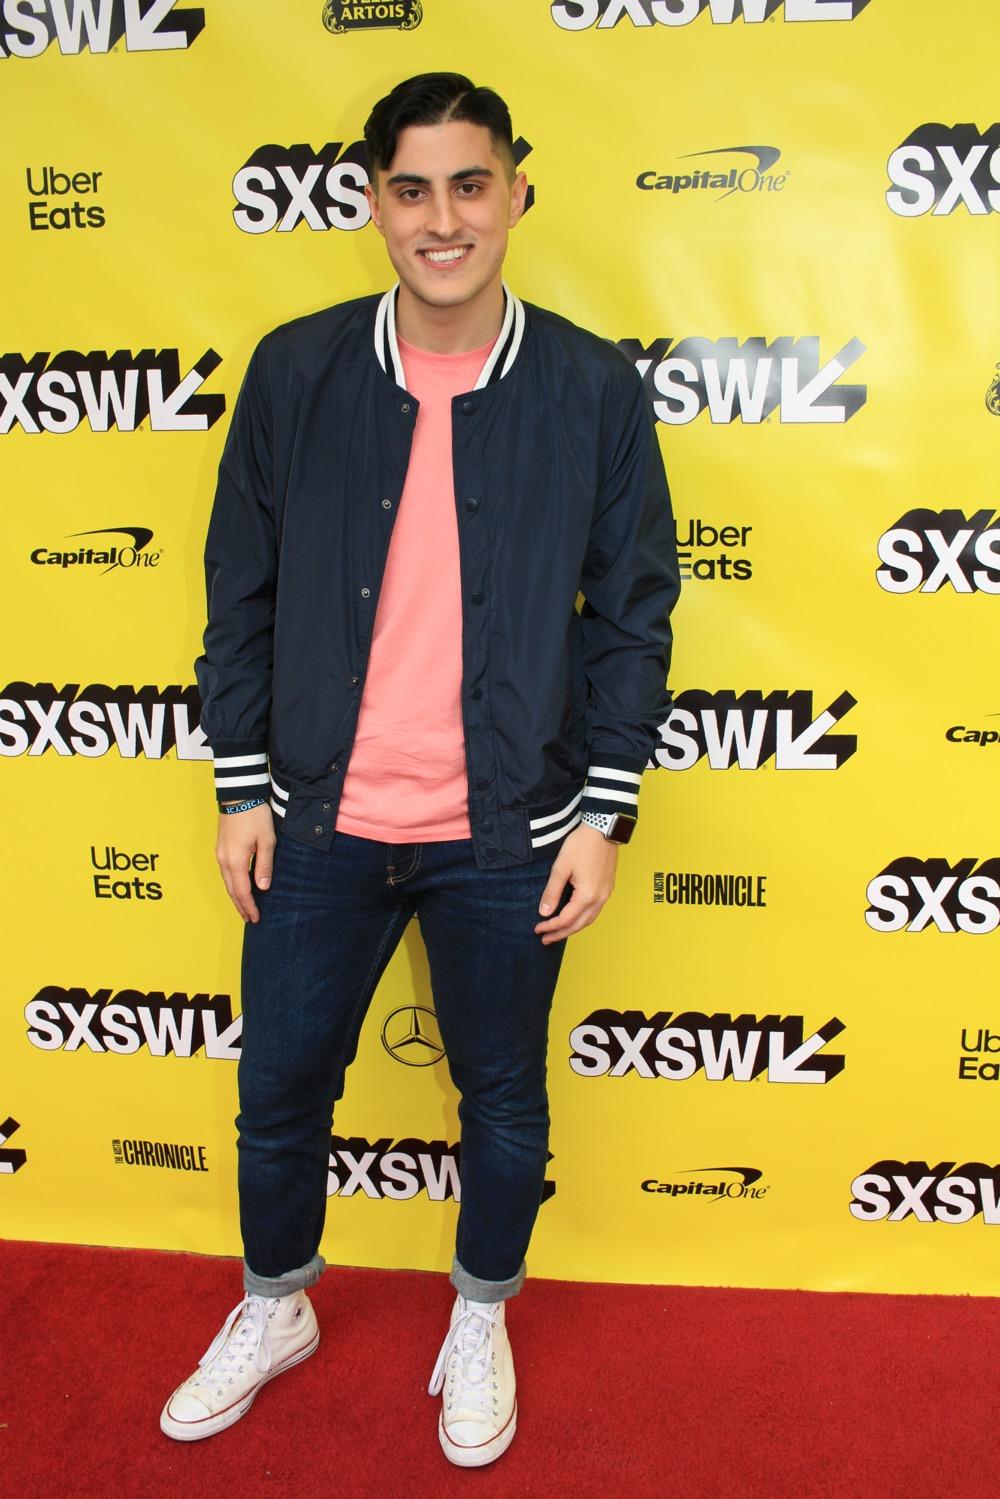 Band Together with Logic, SXSW, Red Carpet Photo, Ariea Bastami